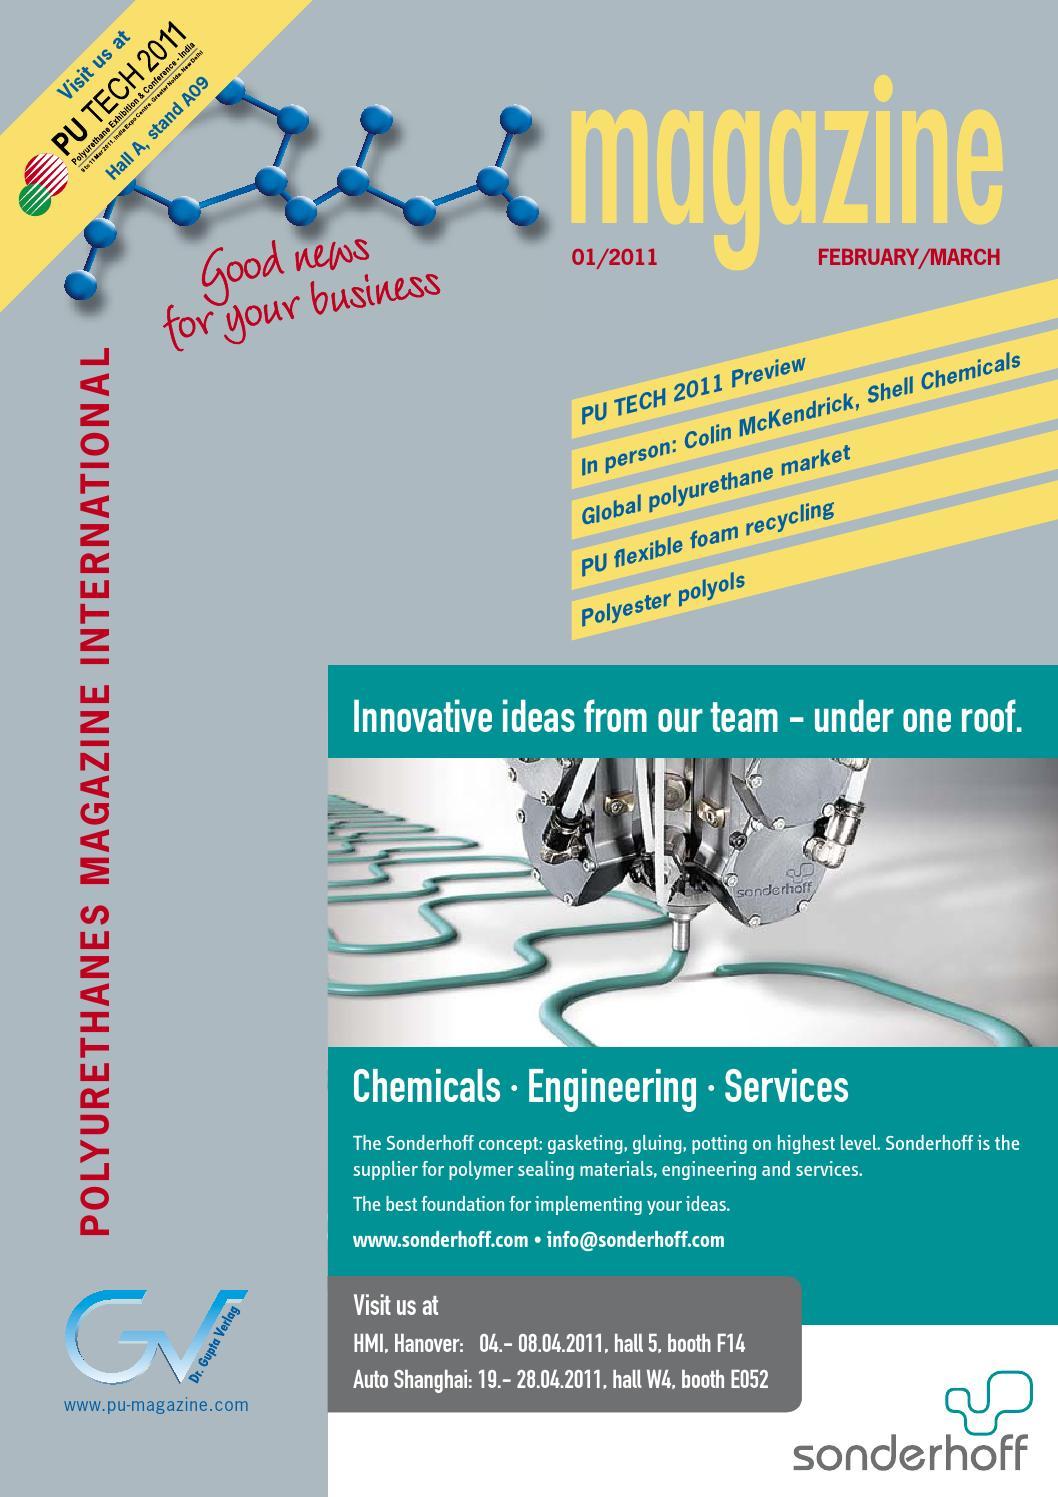 PU magazine international 1/2011 by Dr  Gupta Verlag - issuu